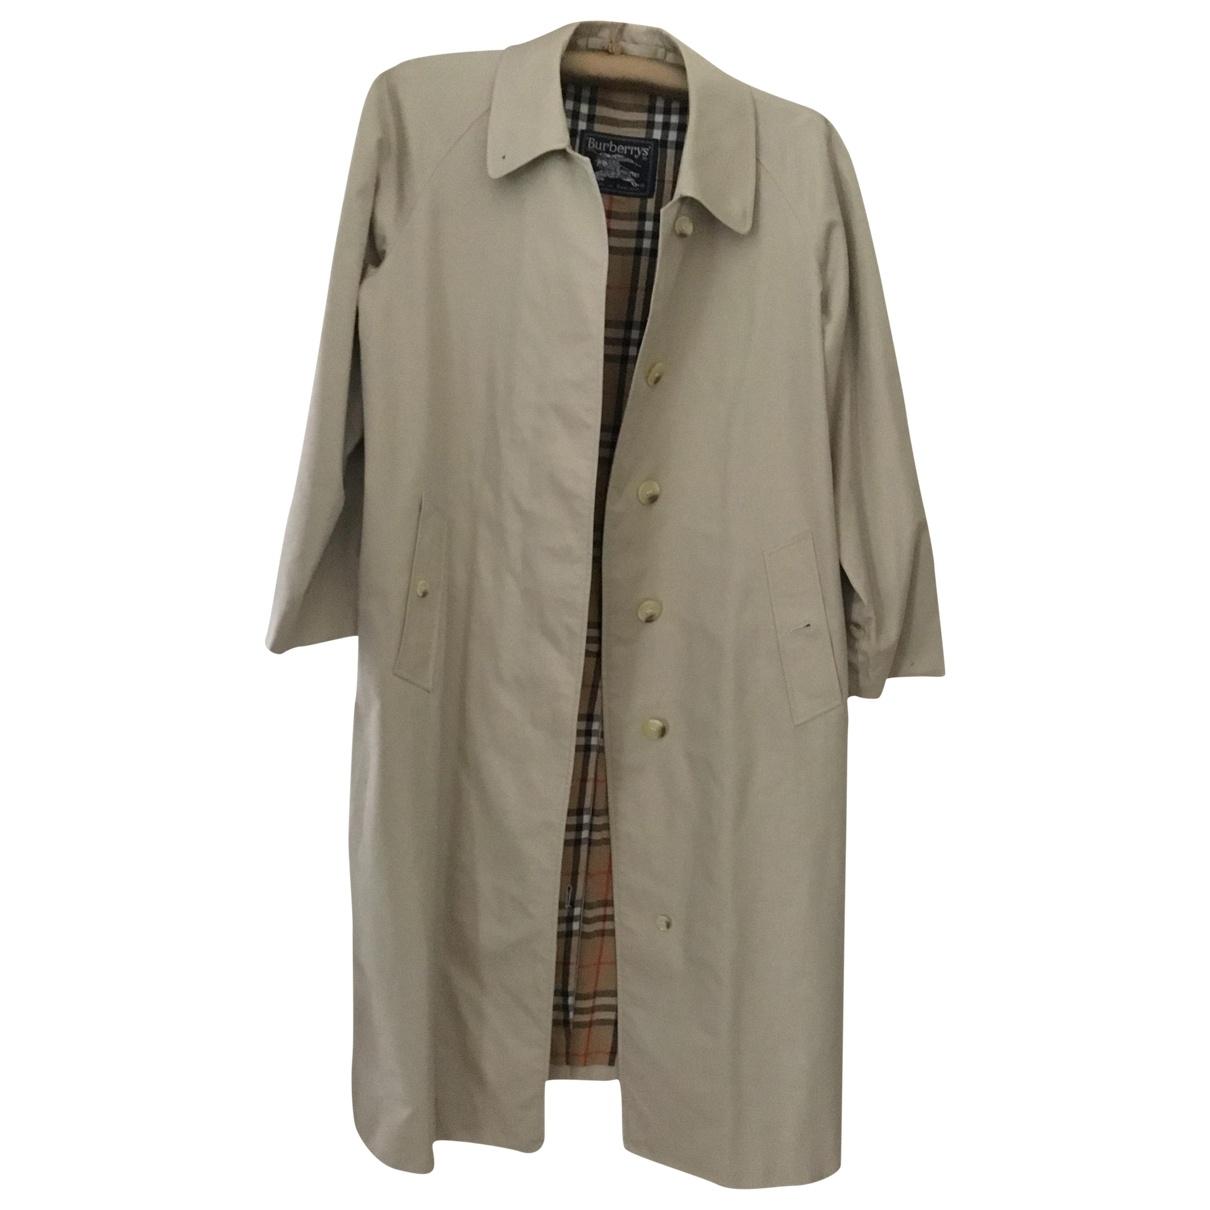 Burberry \N Beige Cotton coat for Women M International